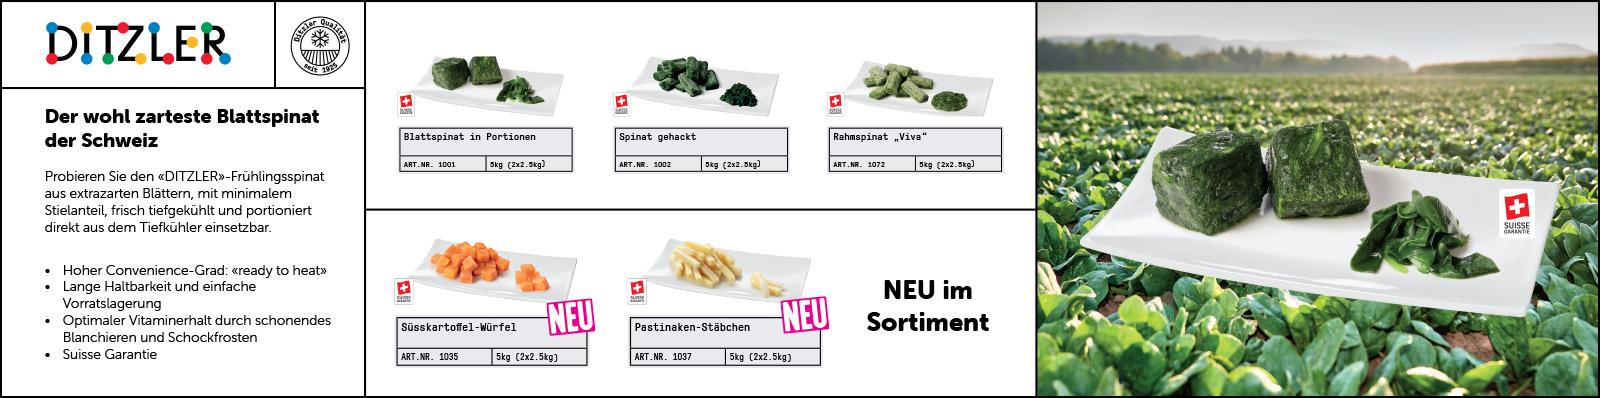 blattspinat-shopbanner-eggenschwiler